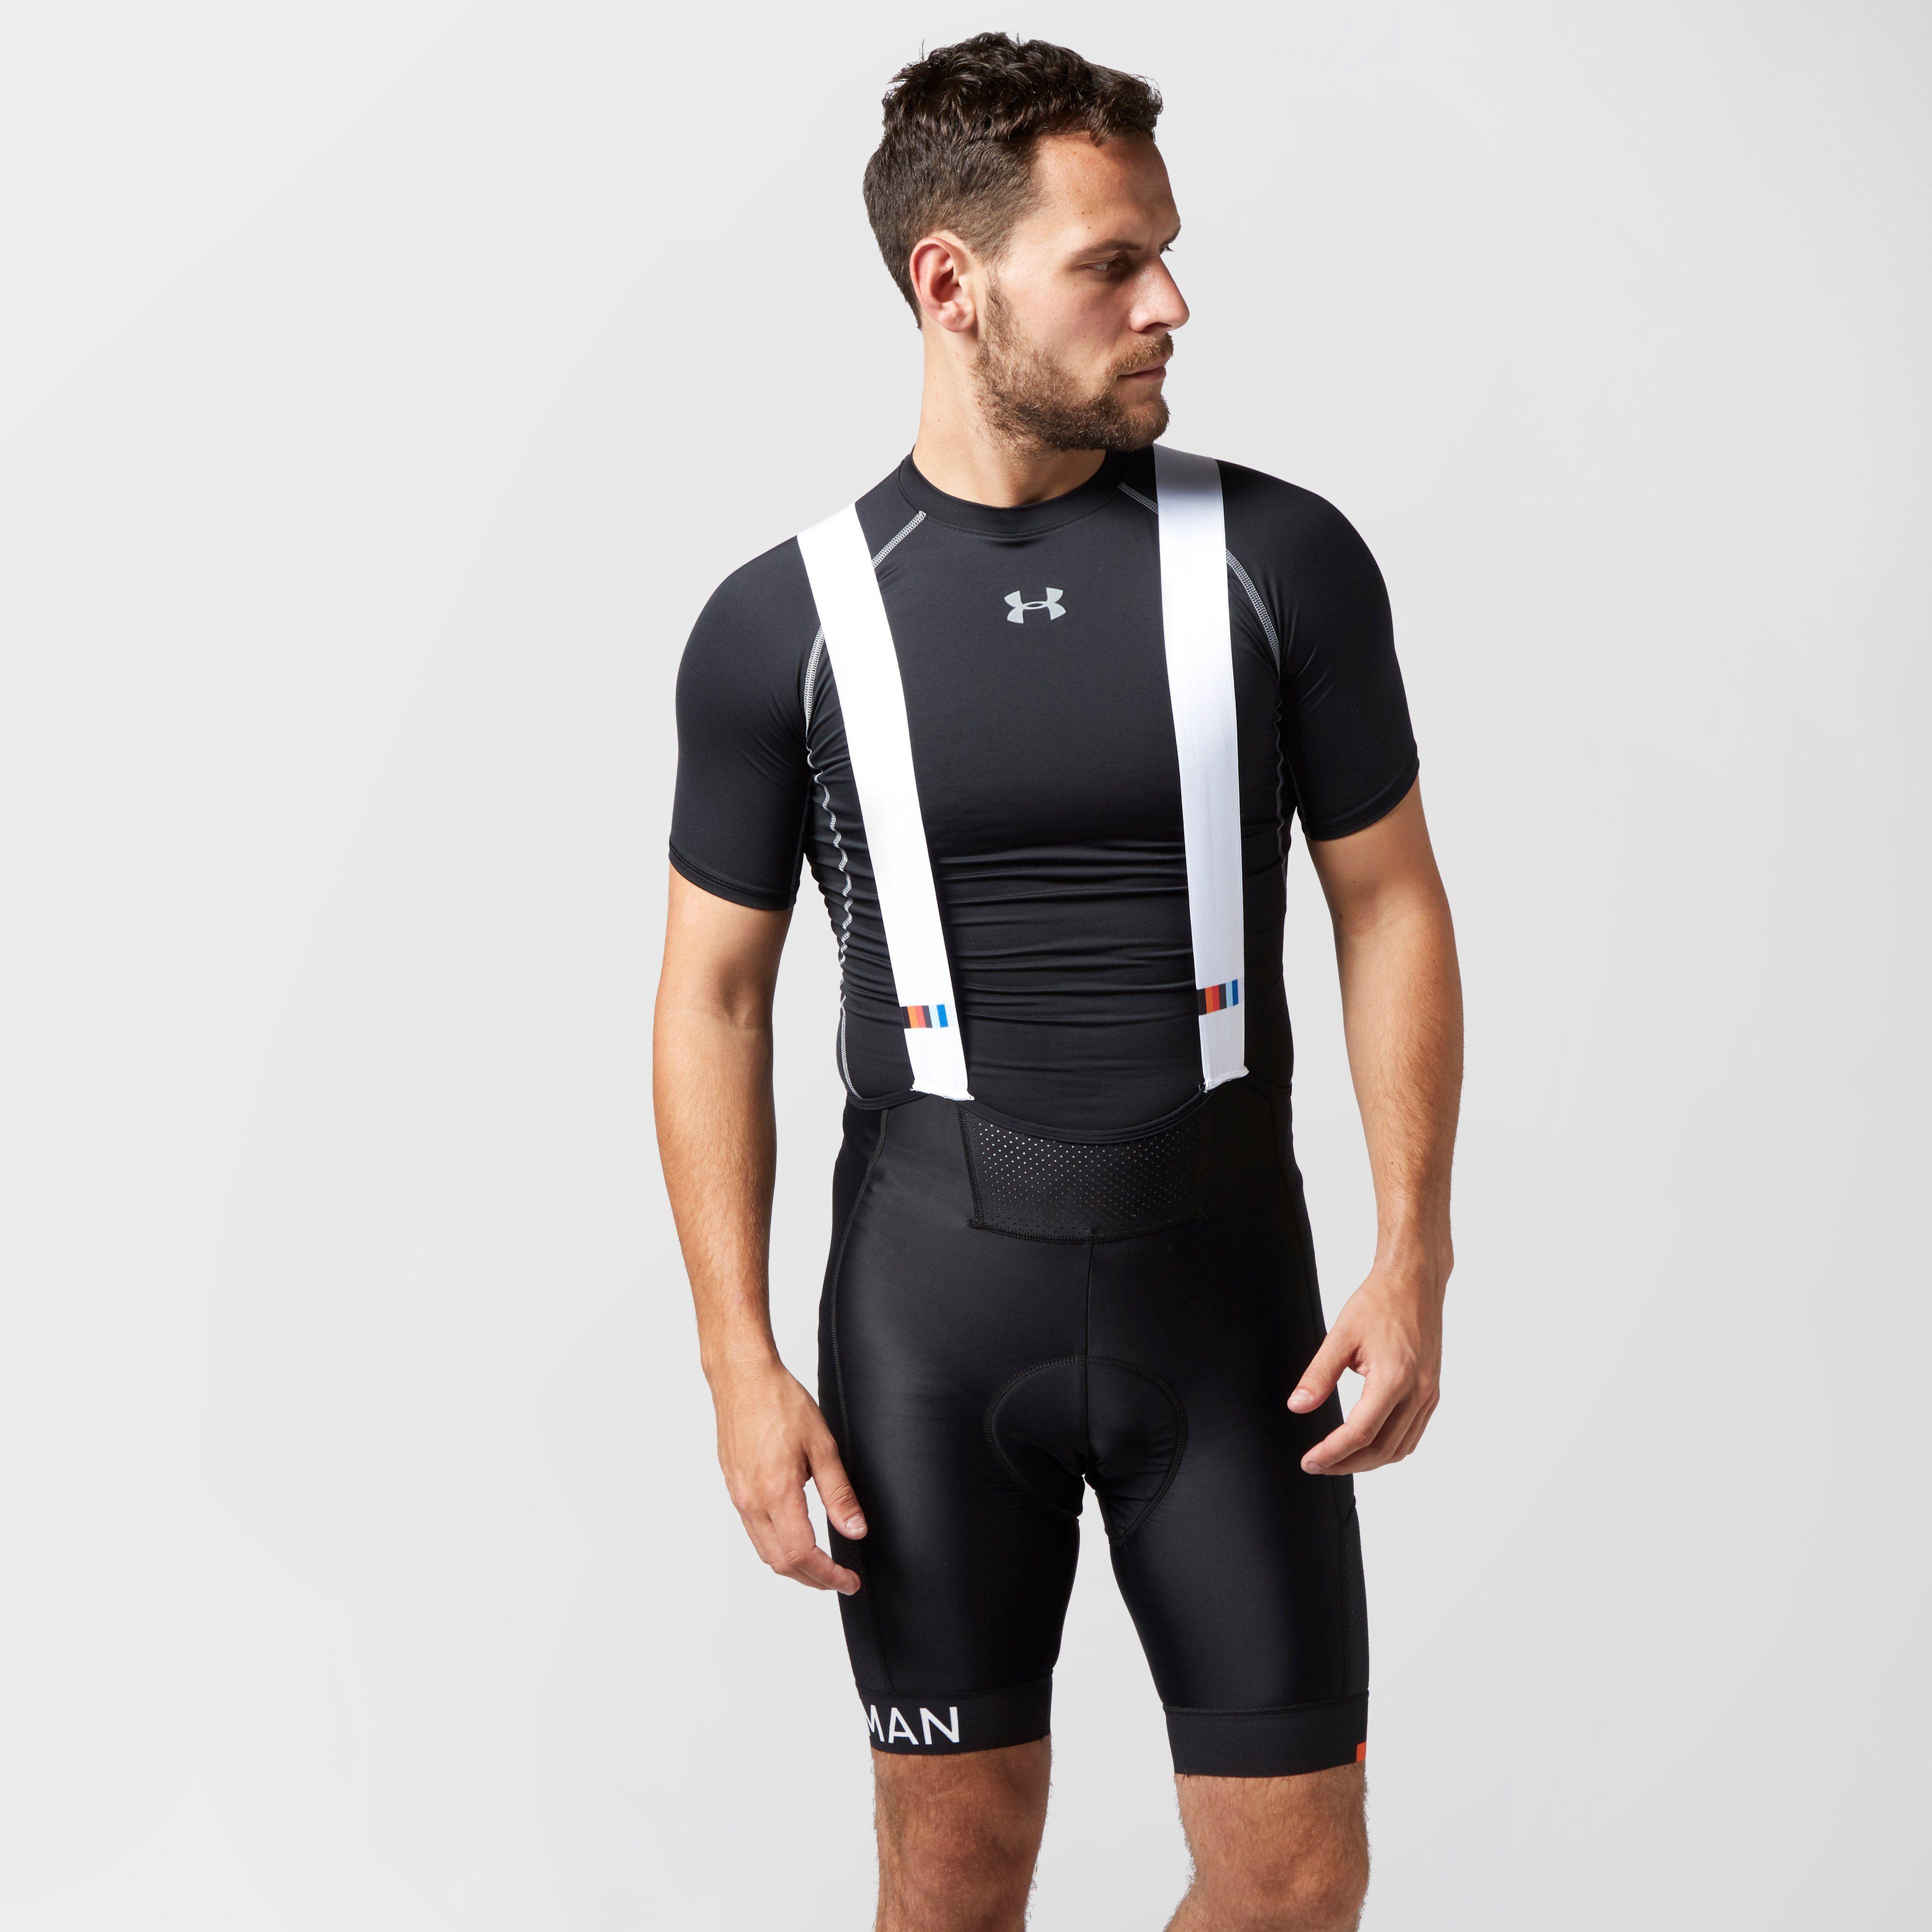 SPOKESMAN Men's Chronicle Cycling Shorts